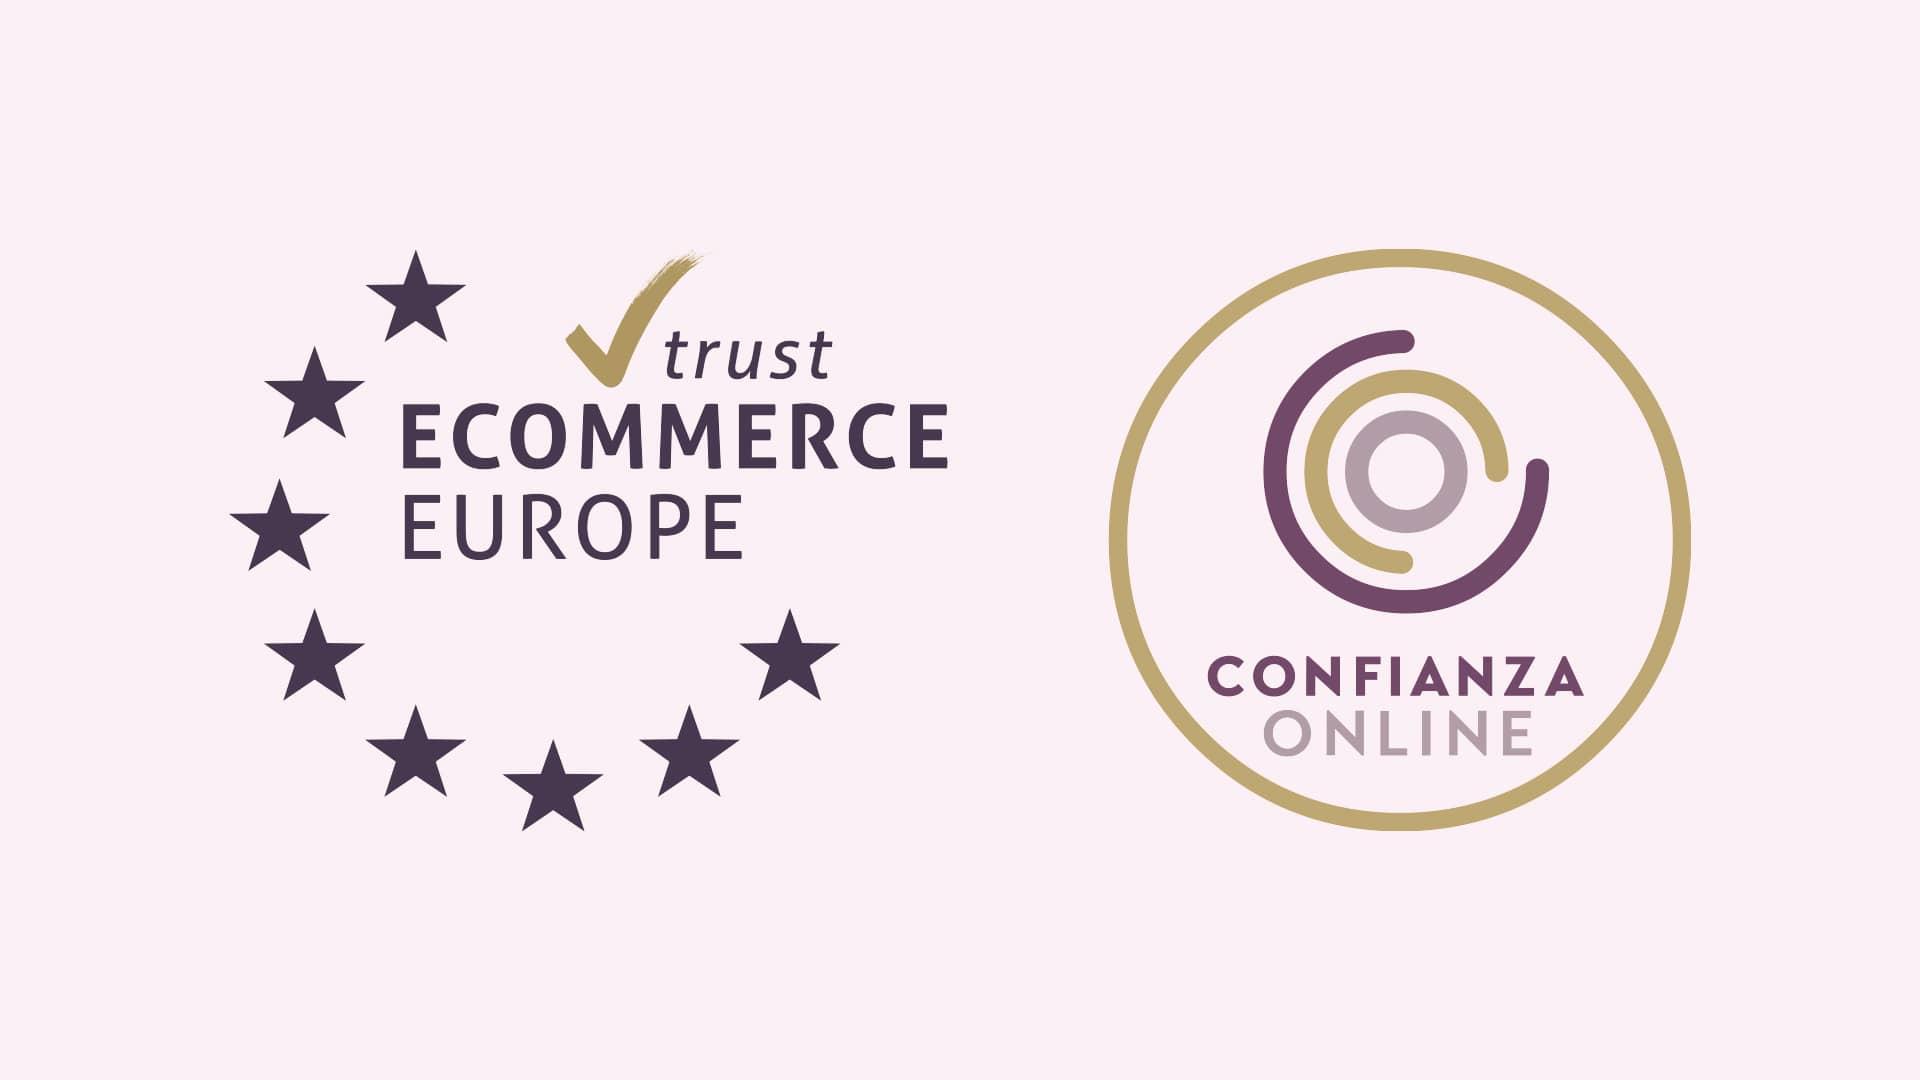 Confianza Online se une al Sello europeo de confianza con Ecommerce Europe